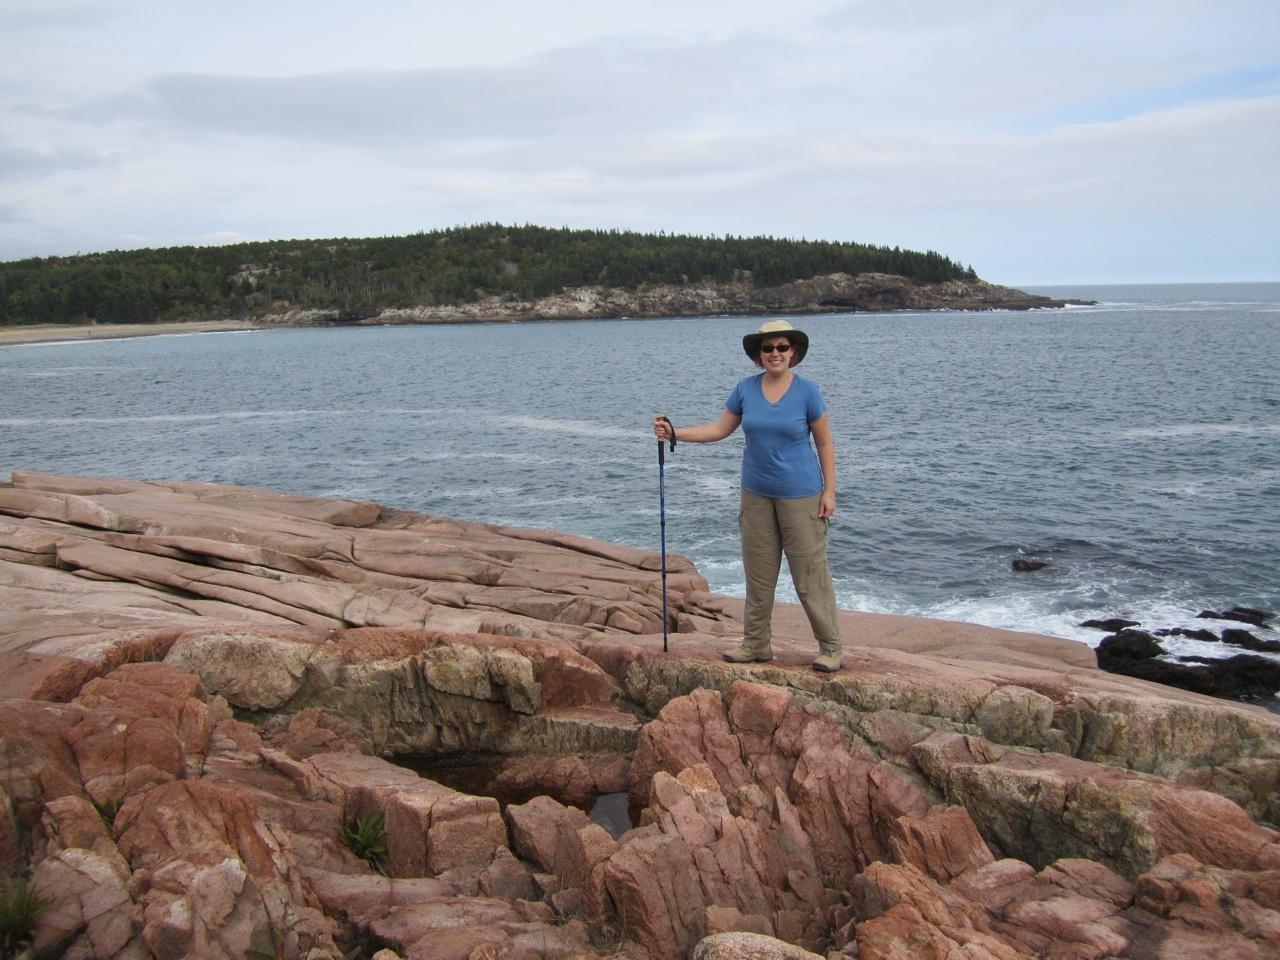 Brenda On Hike In Acadia National Park